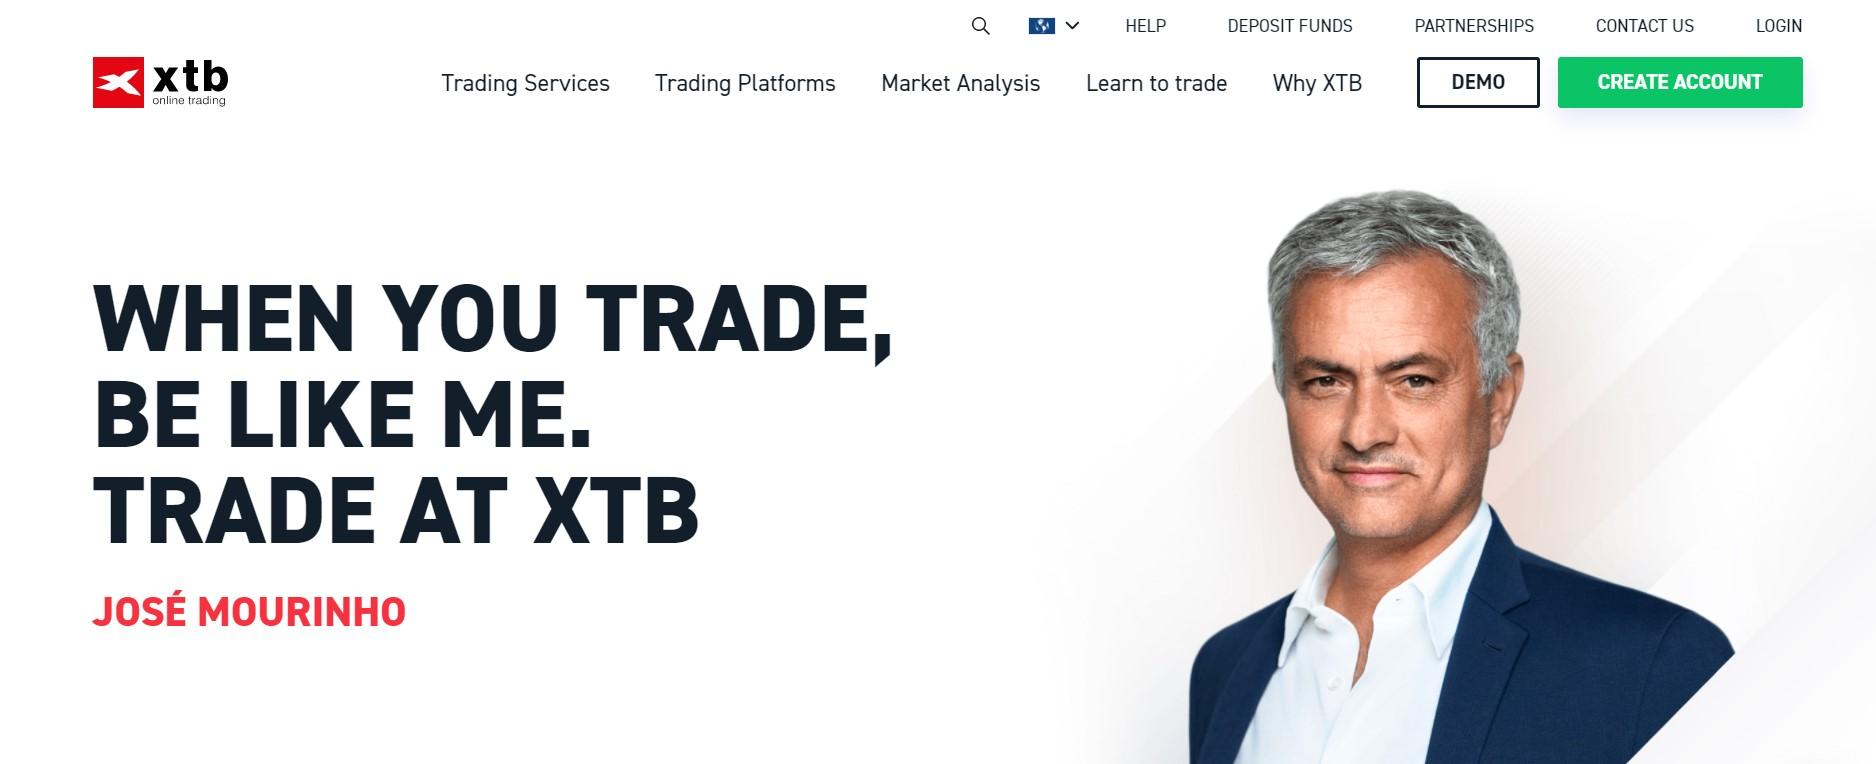 XTB website